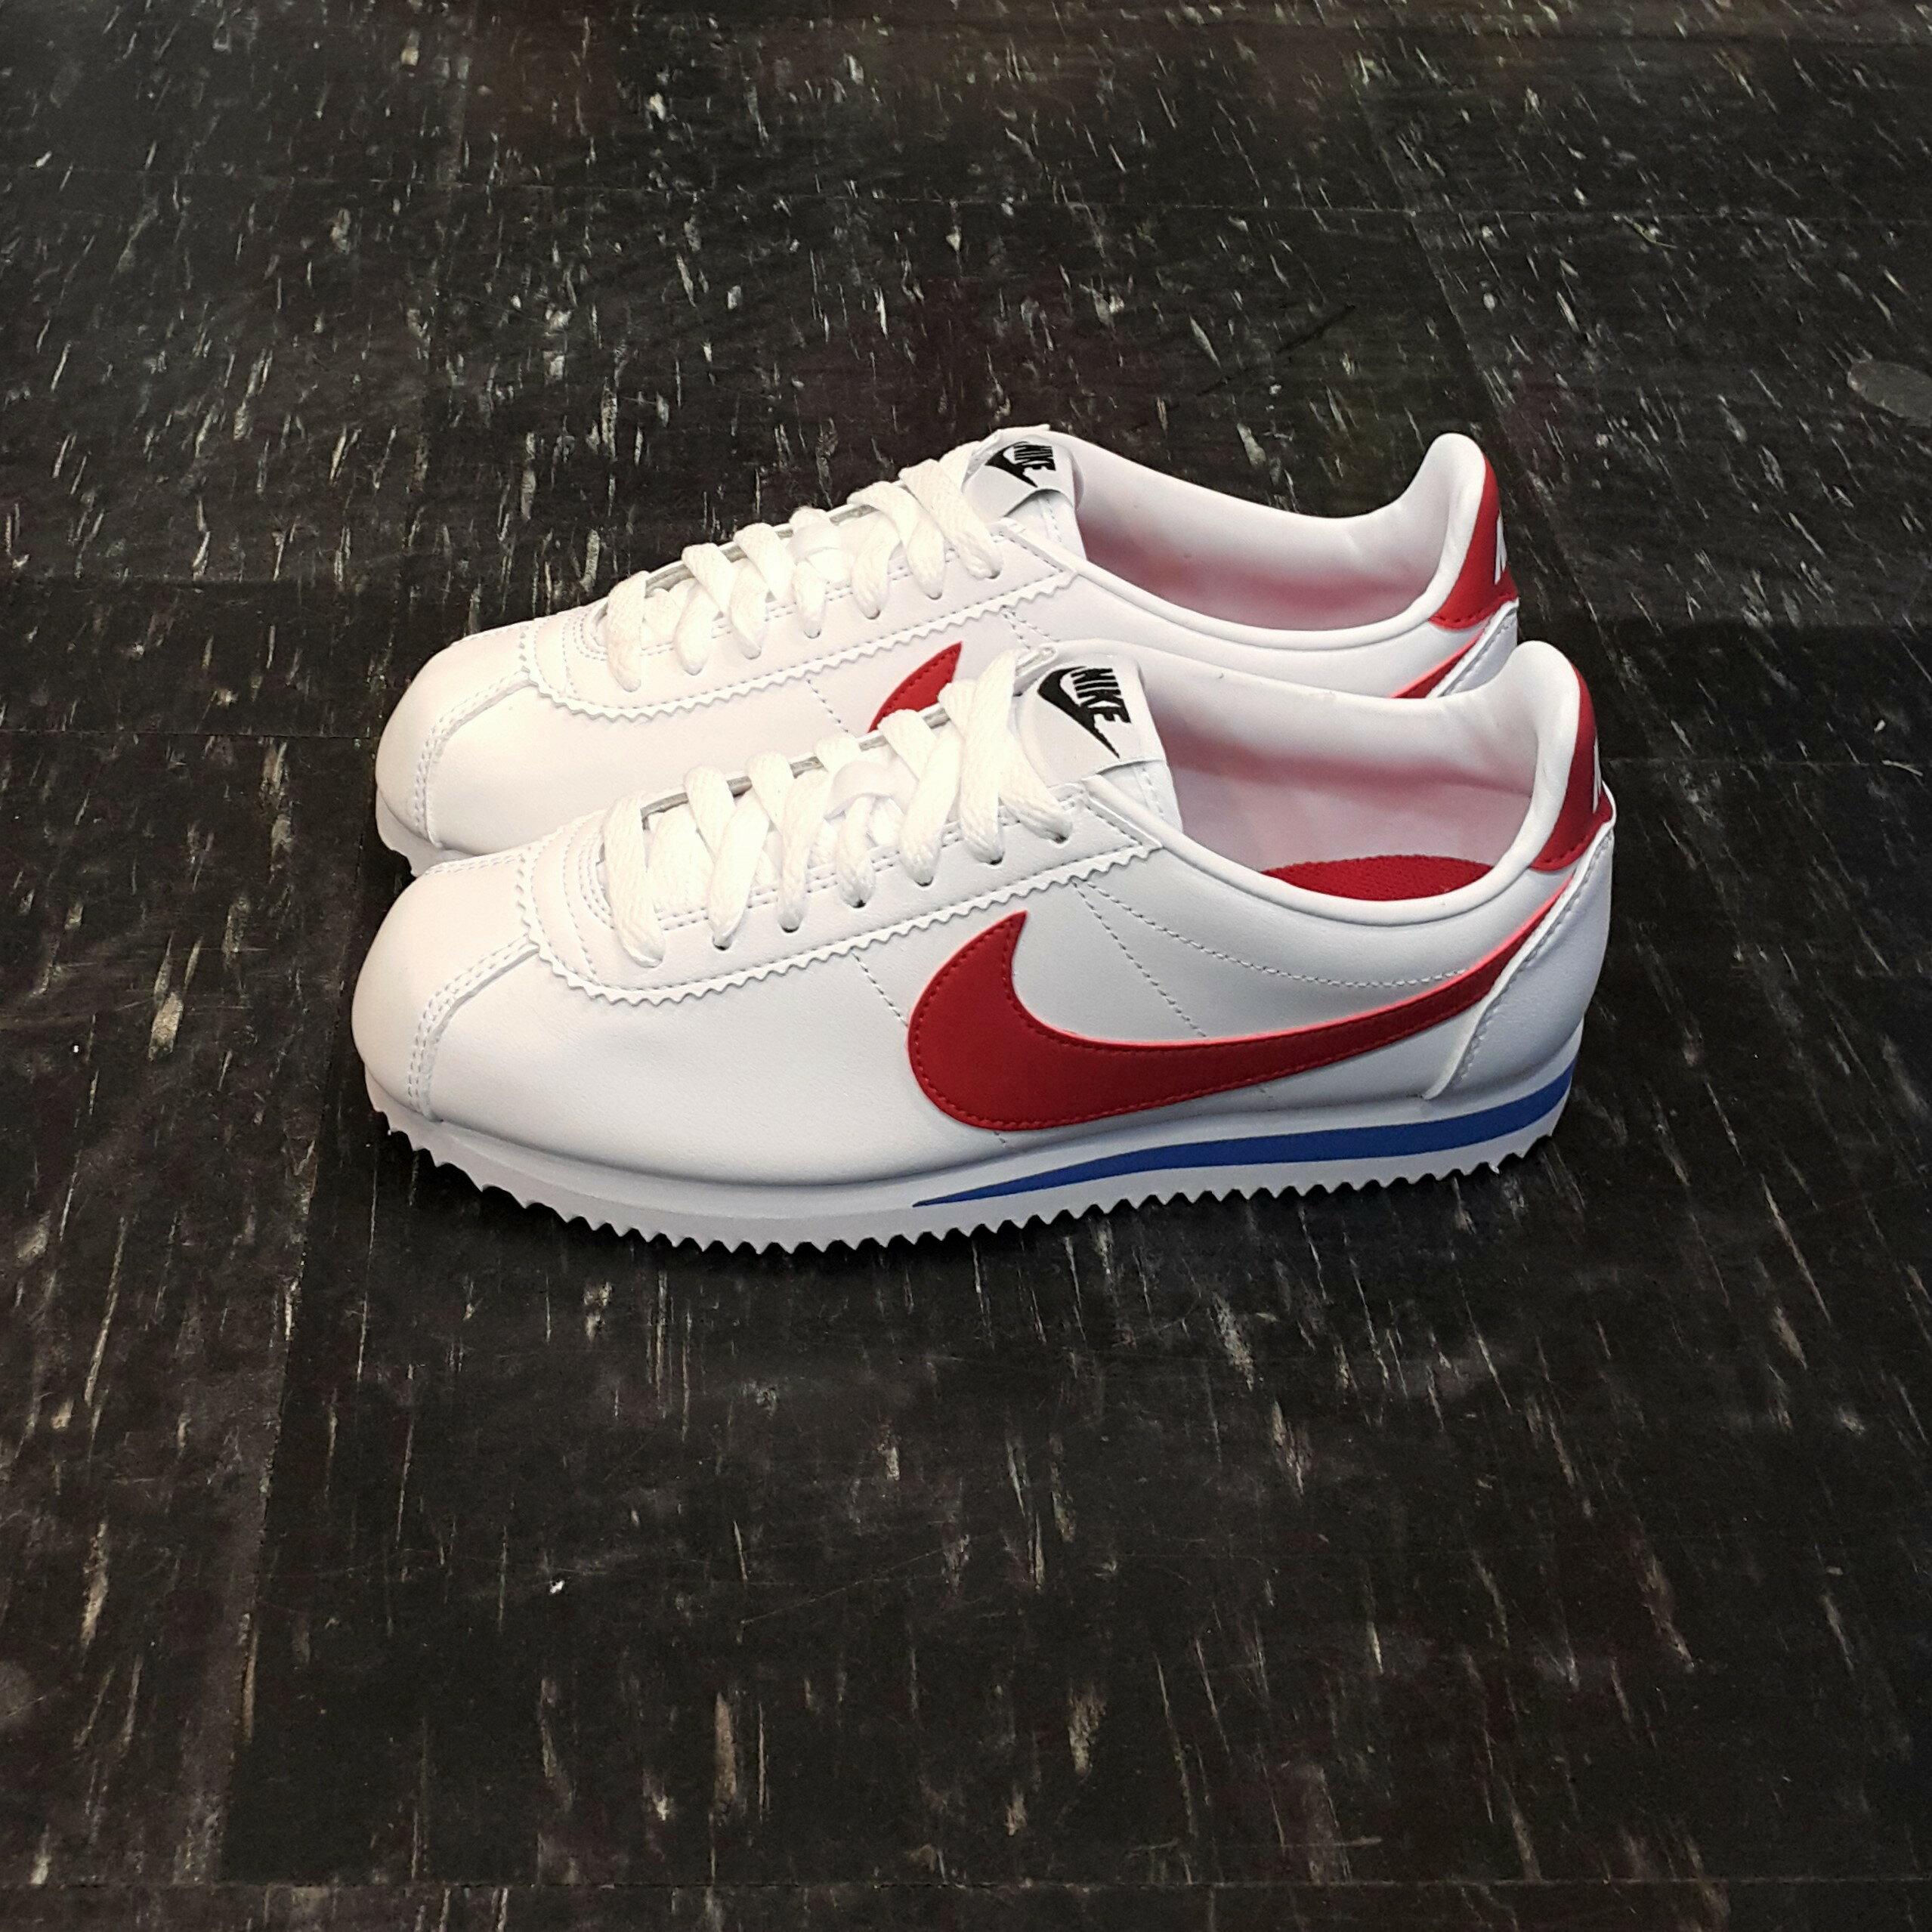 NIKE WMNS CLASSIC CORTEZ LEATHER 阿甘鞋 白色 红色 白红 红勾 白红蓝 白底红勾 皮革 经典 807471-103